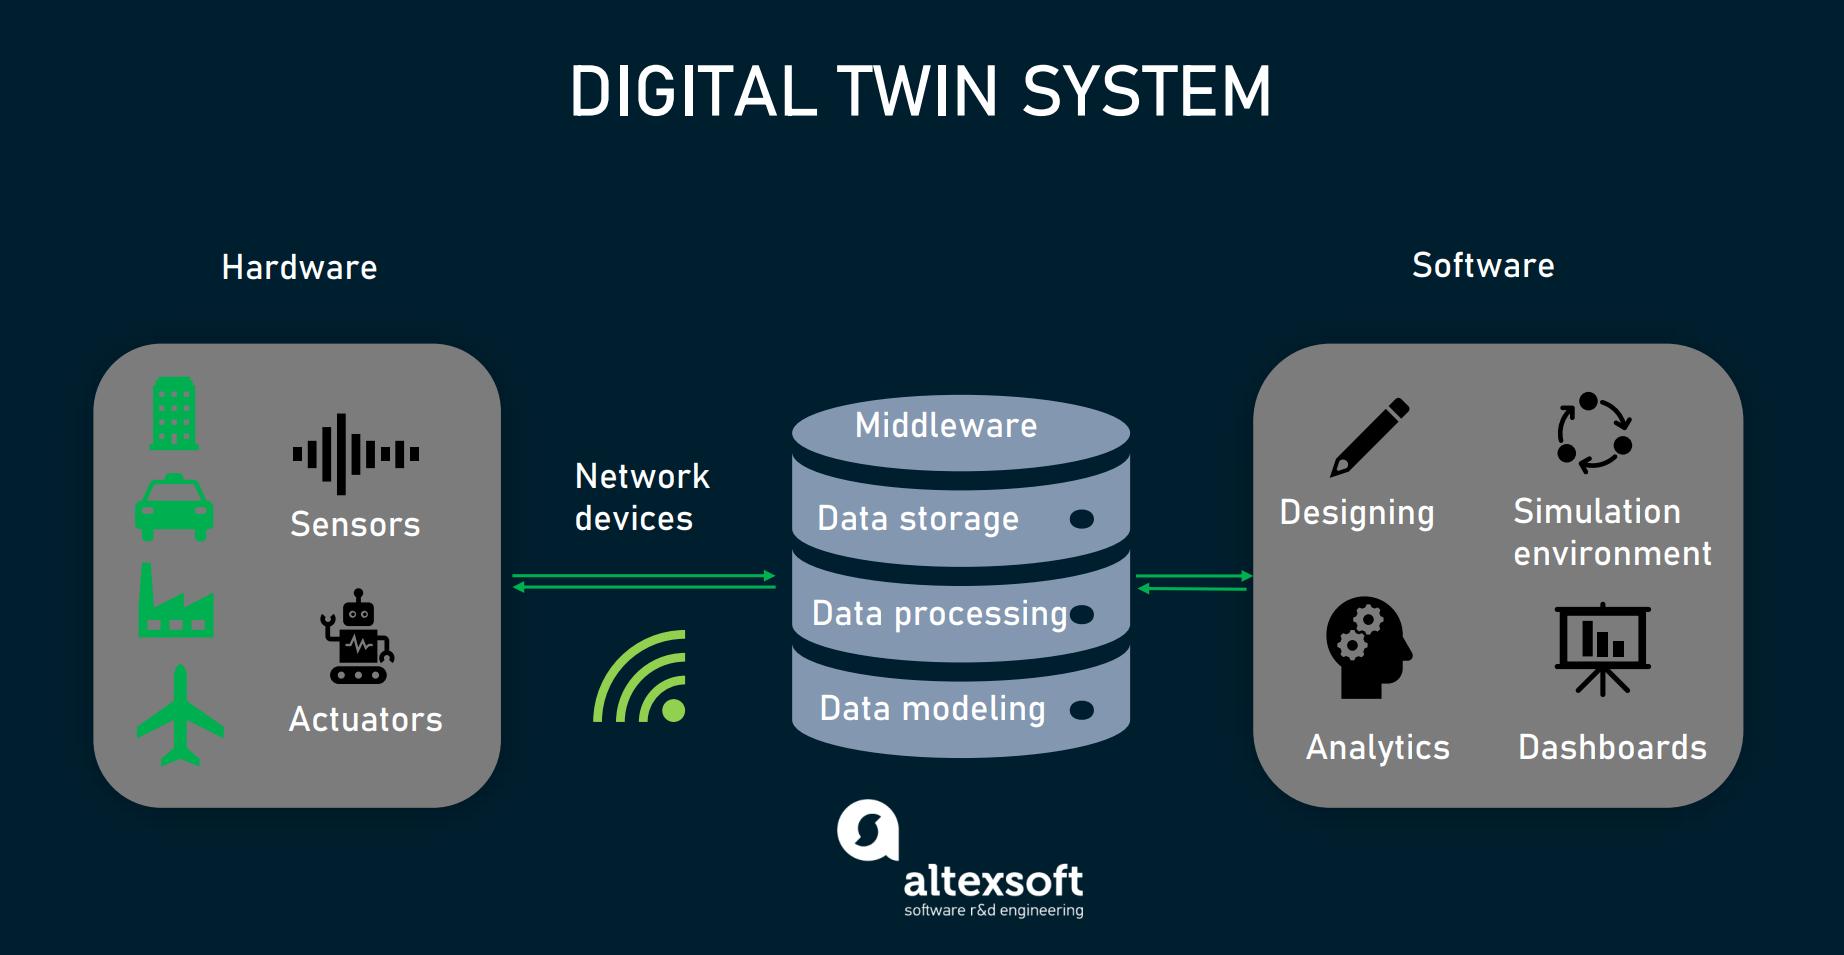 Digital twin system